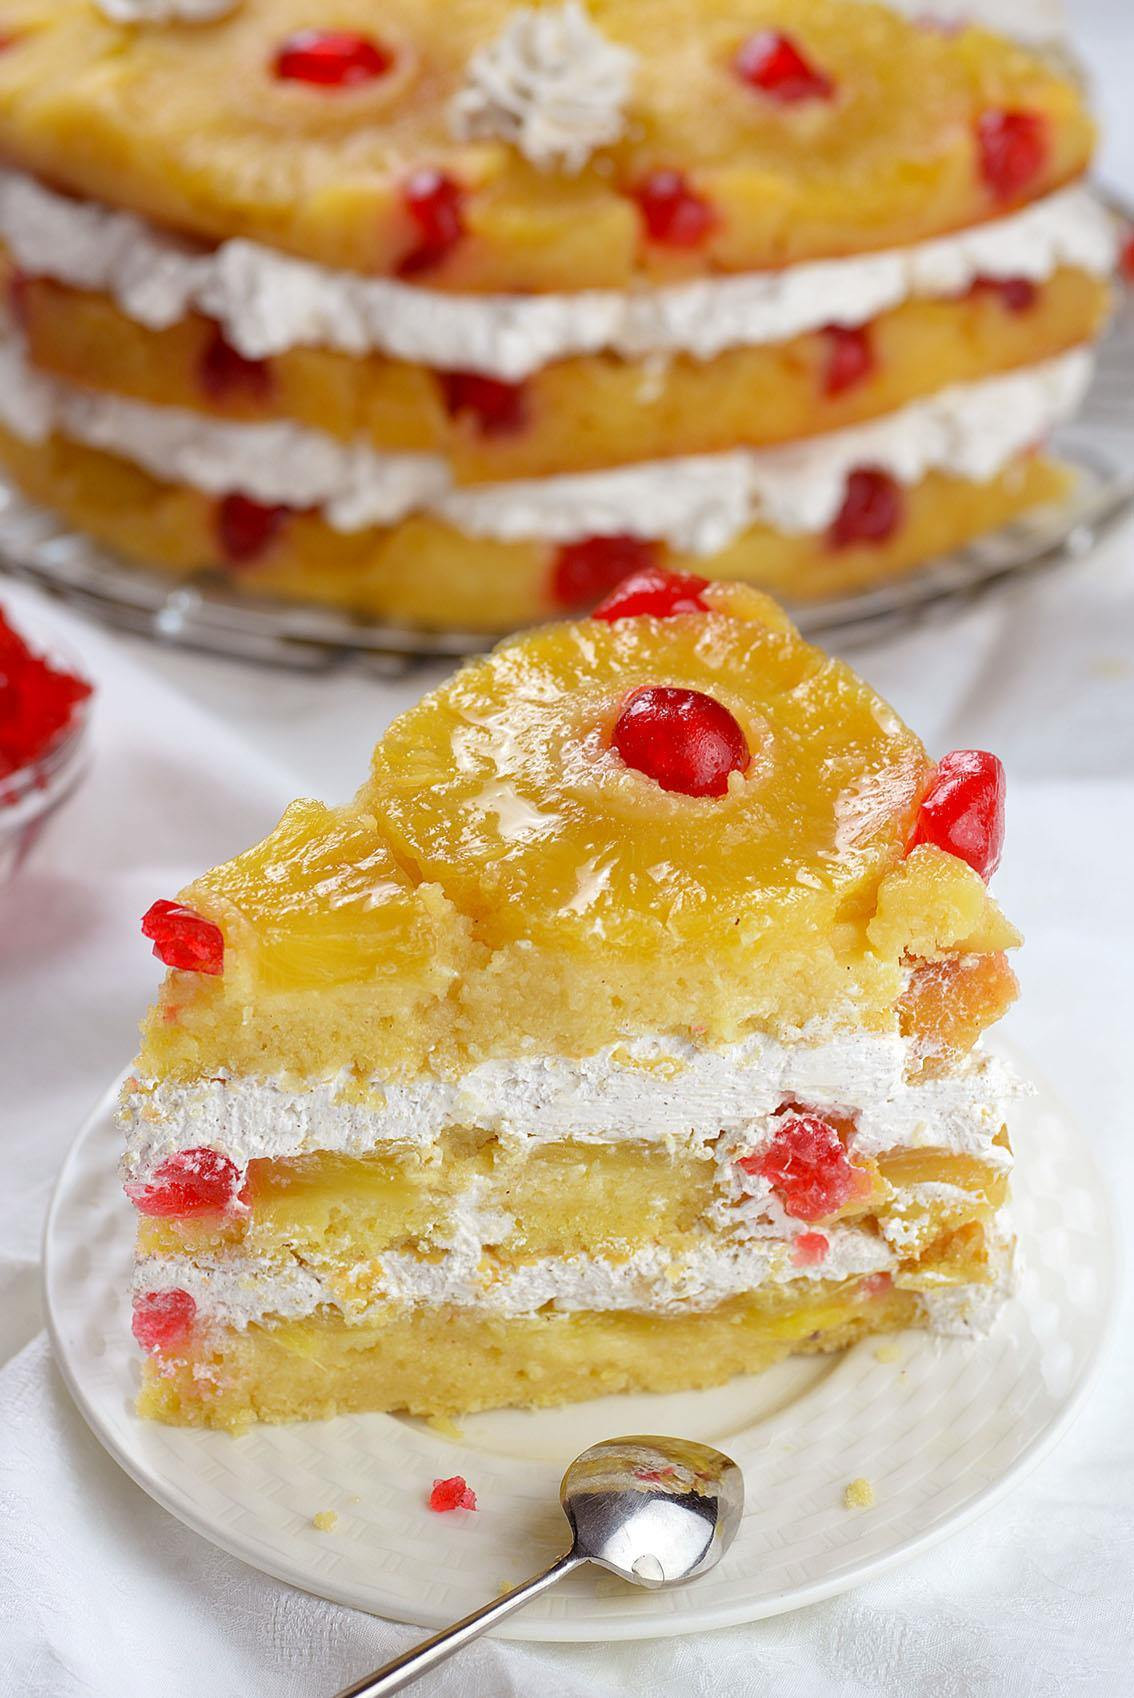 Pineapple Upside Down Cake Recipe  Pineapple Upside Down Cake